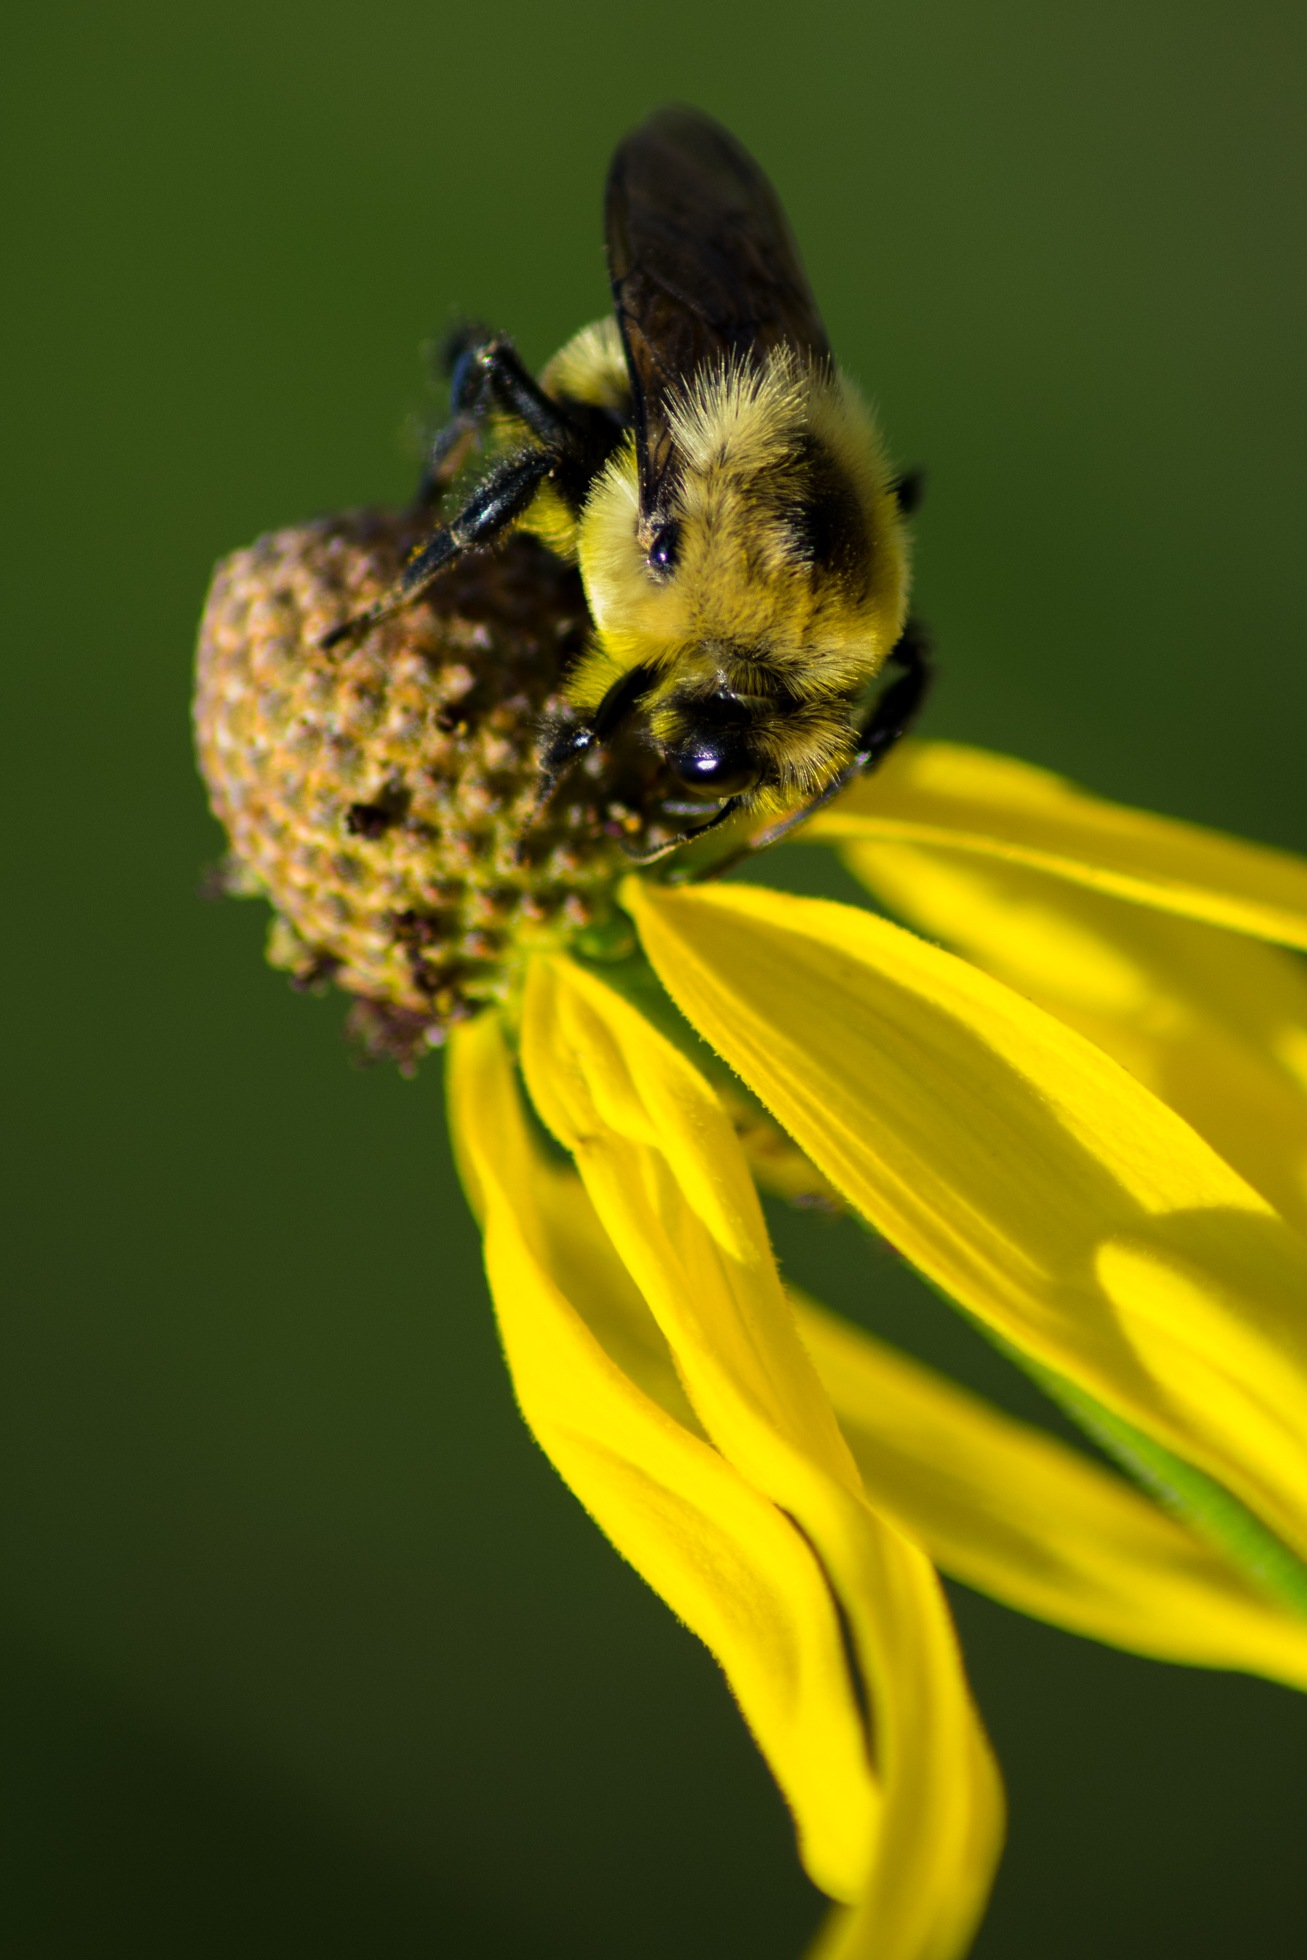 Bumblebee Fuzz by WesShealey